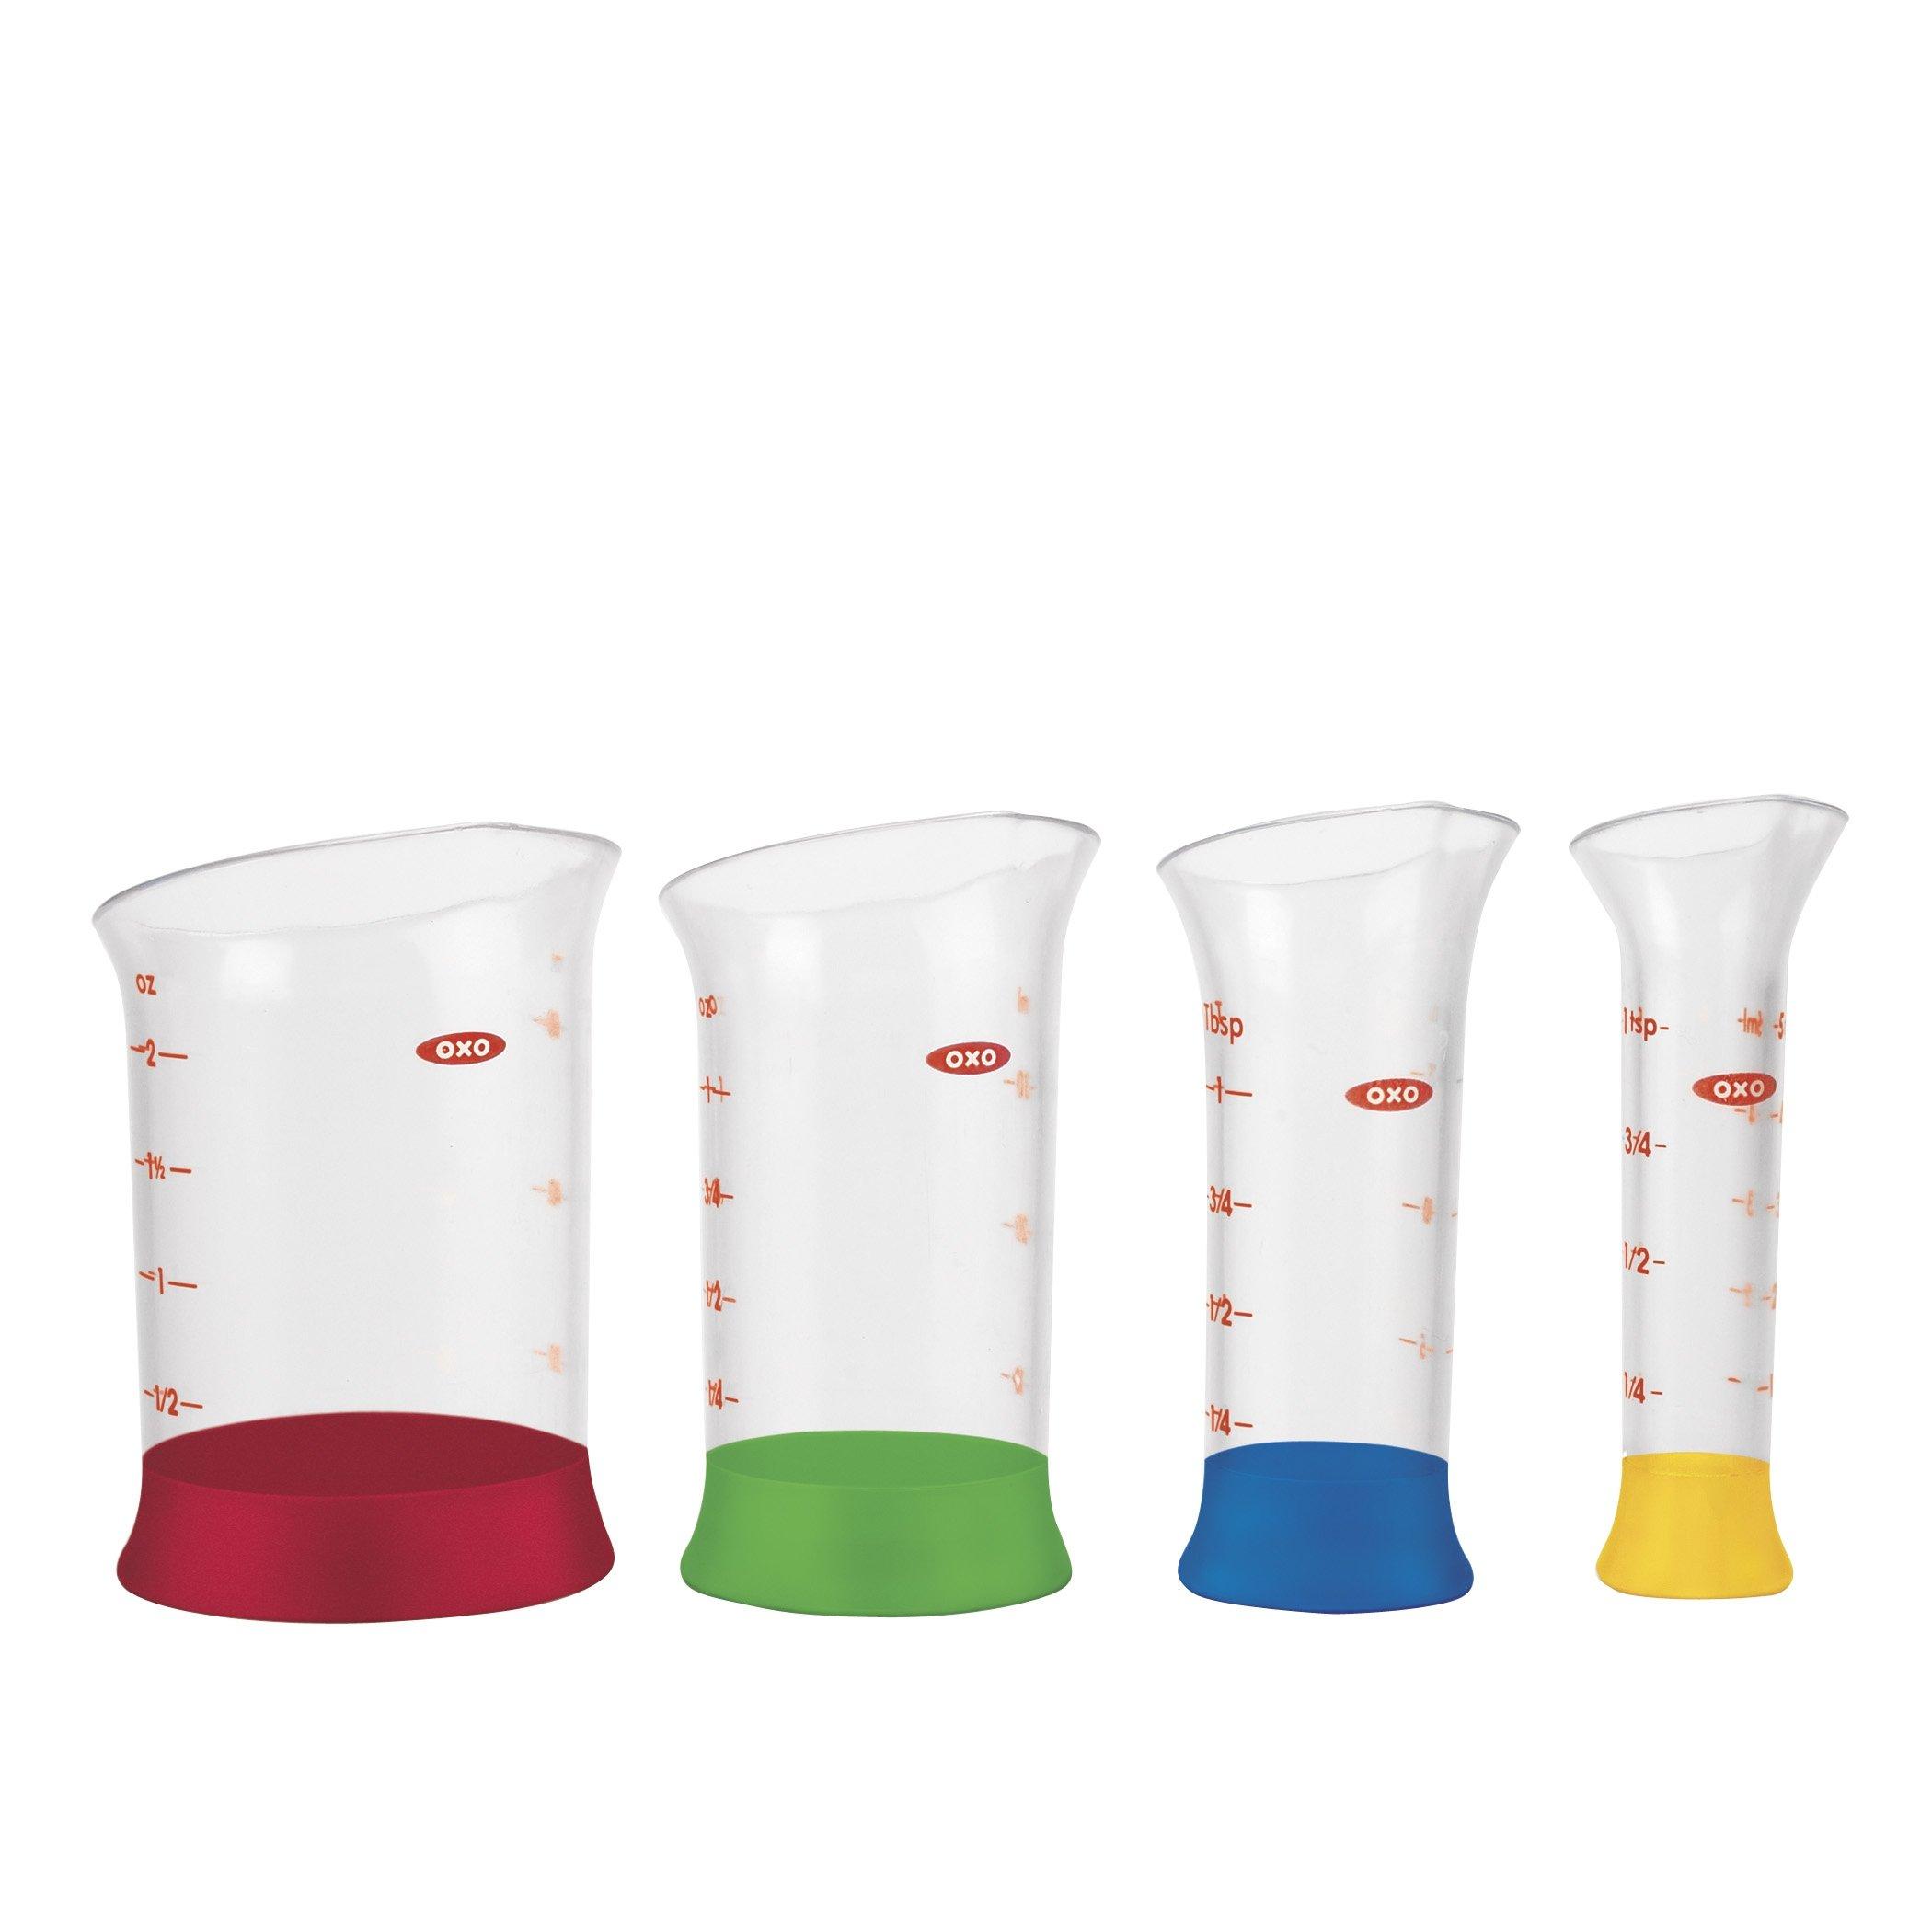 OXO 1245380 Good Grips 4-Piece Mini Measuring Beaker Set,Clear